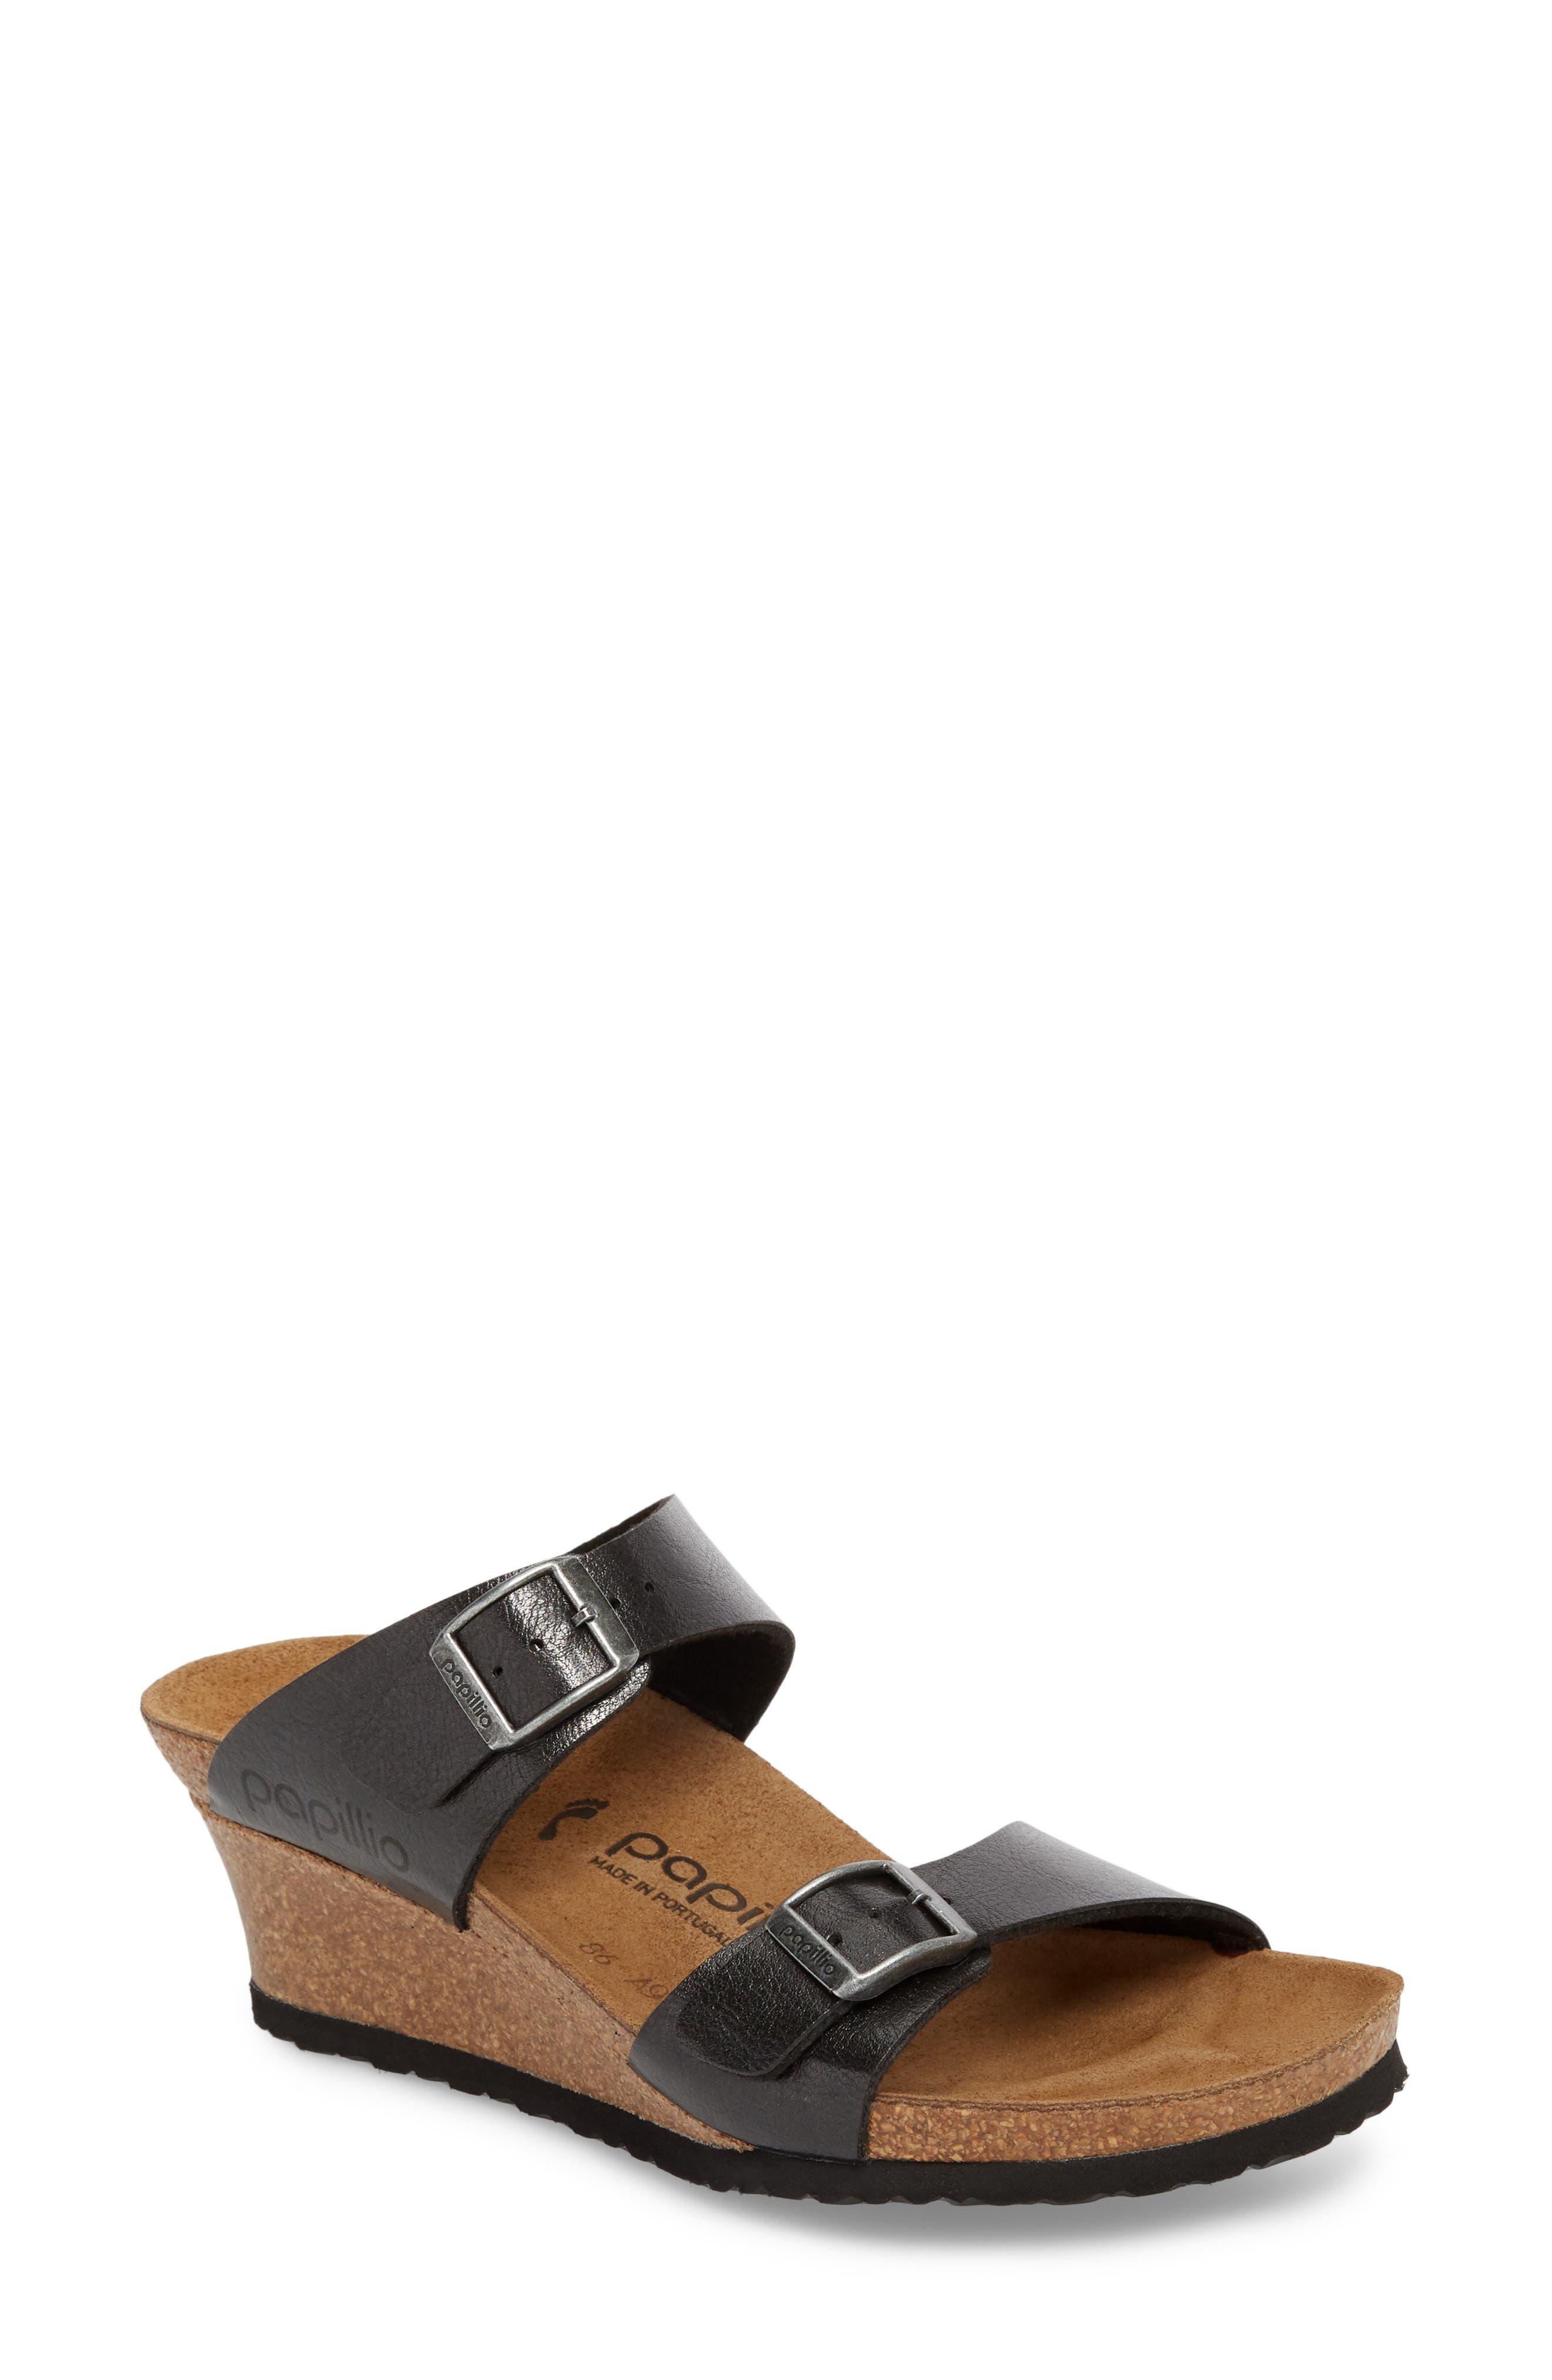 Papillio by Birkenstock Dorothy Wedge Slide Sandal,                         Main,                         color, Graceful Licorice Leather